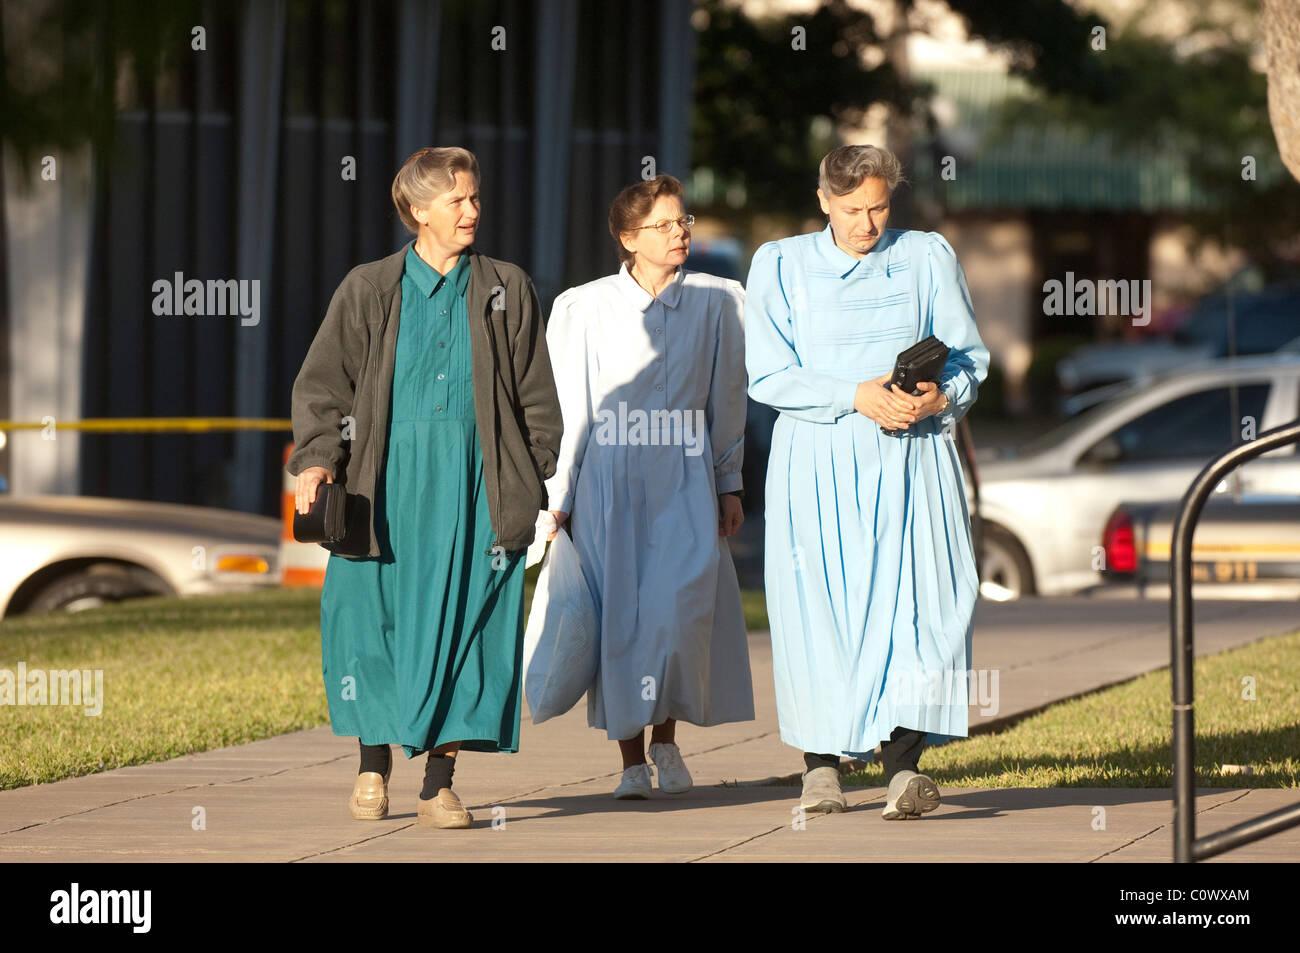 PHOTOS: Inside Polygamy: Life in Warren Jeffs' FLDS Church